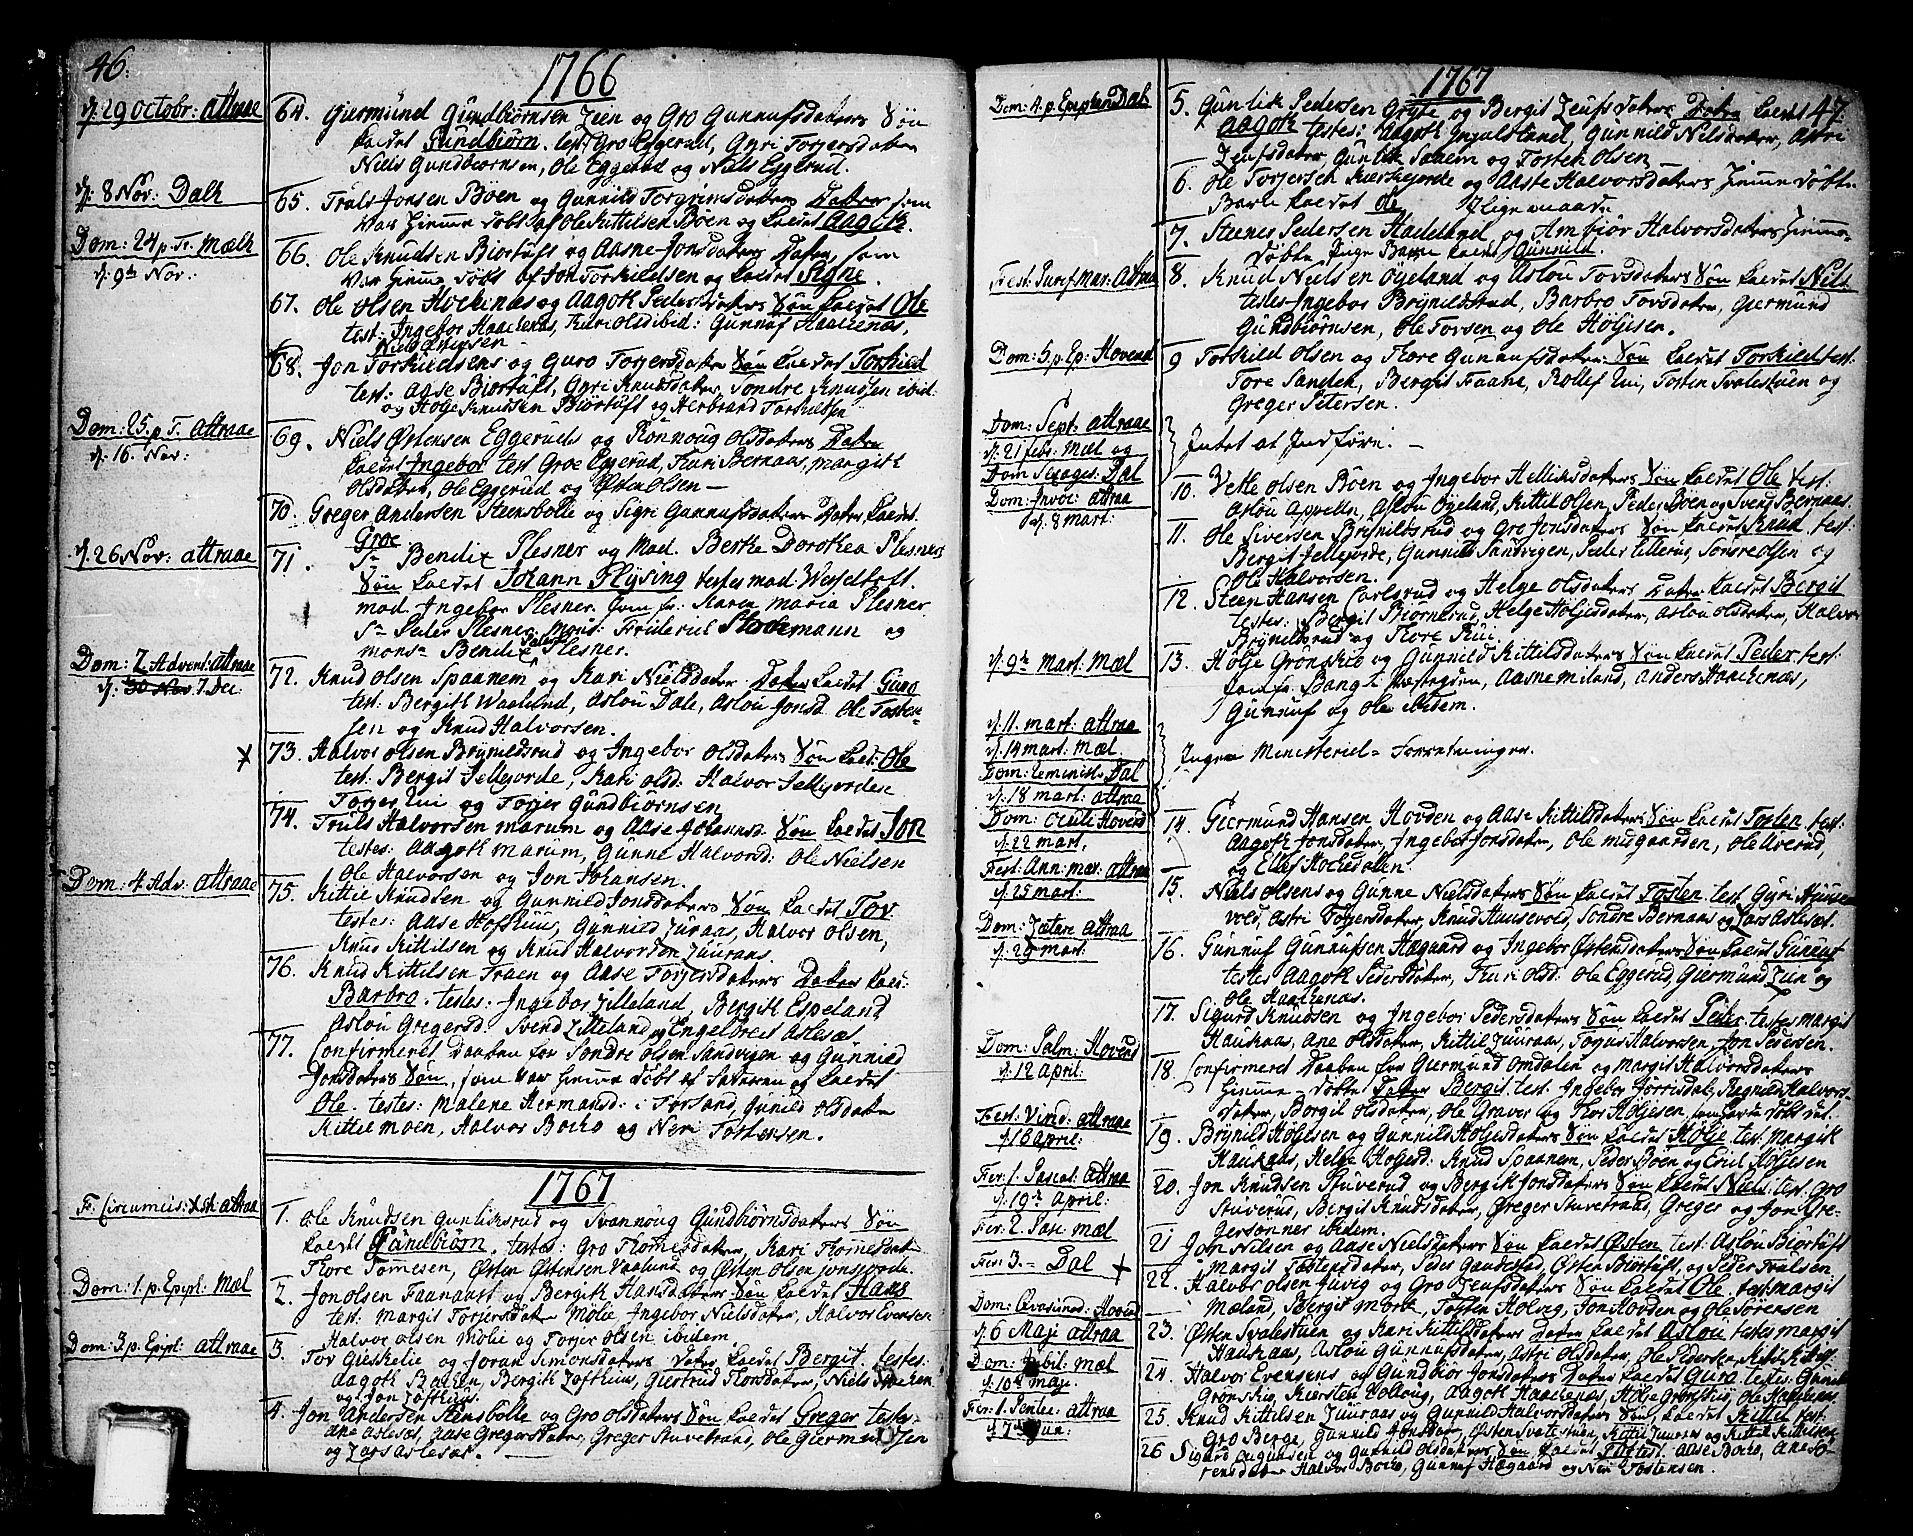 SAKO, Tinn kirkebøker, F/Fa/L0002: Ministerialbok nr. I 2, 1757-1810, s. 46-47